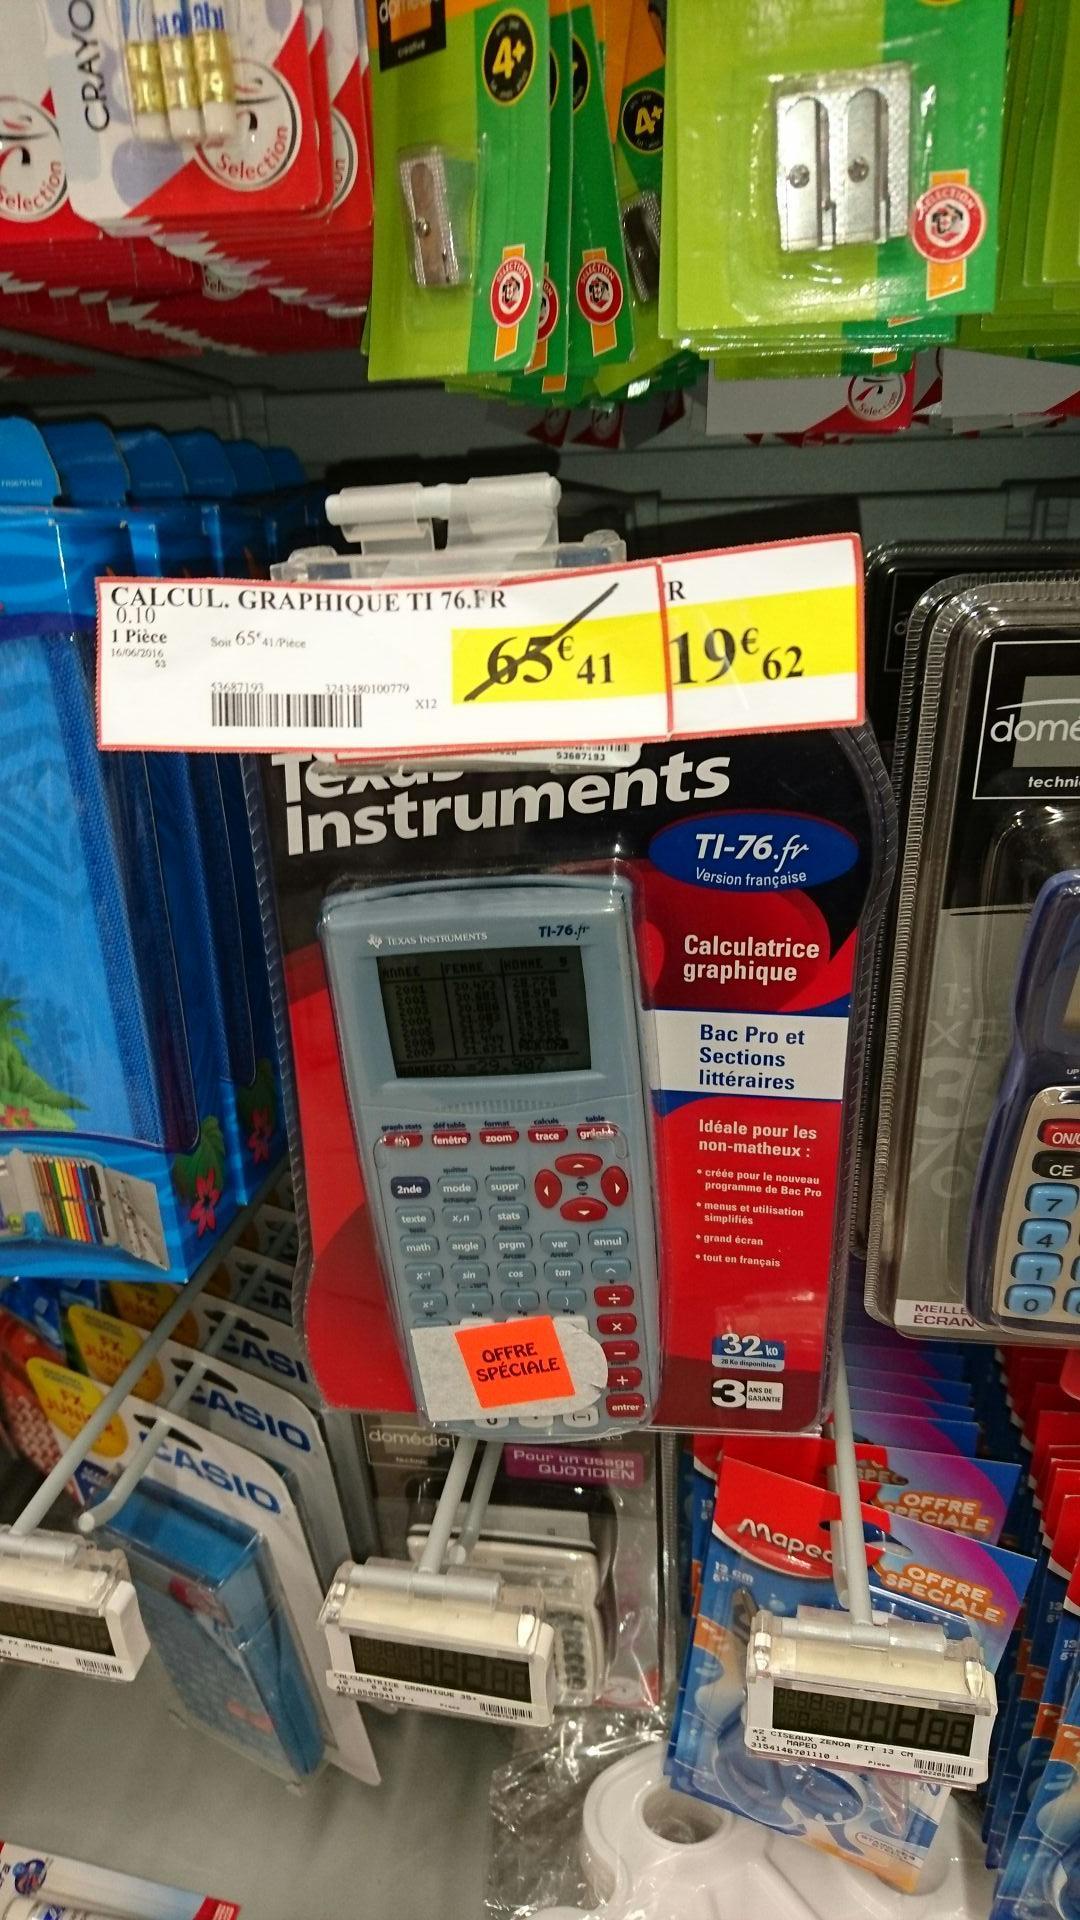 Calculatrice graphique Texas Instruments TI-76FR